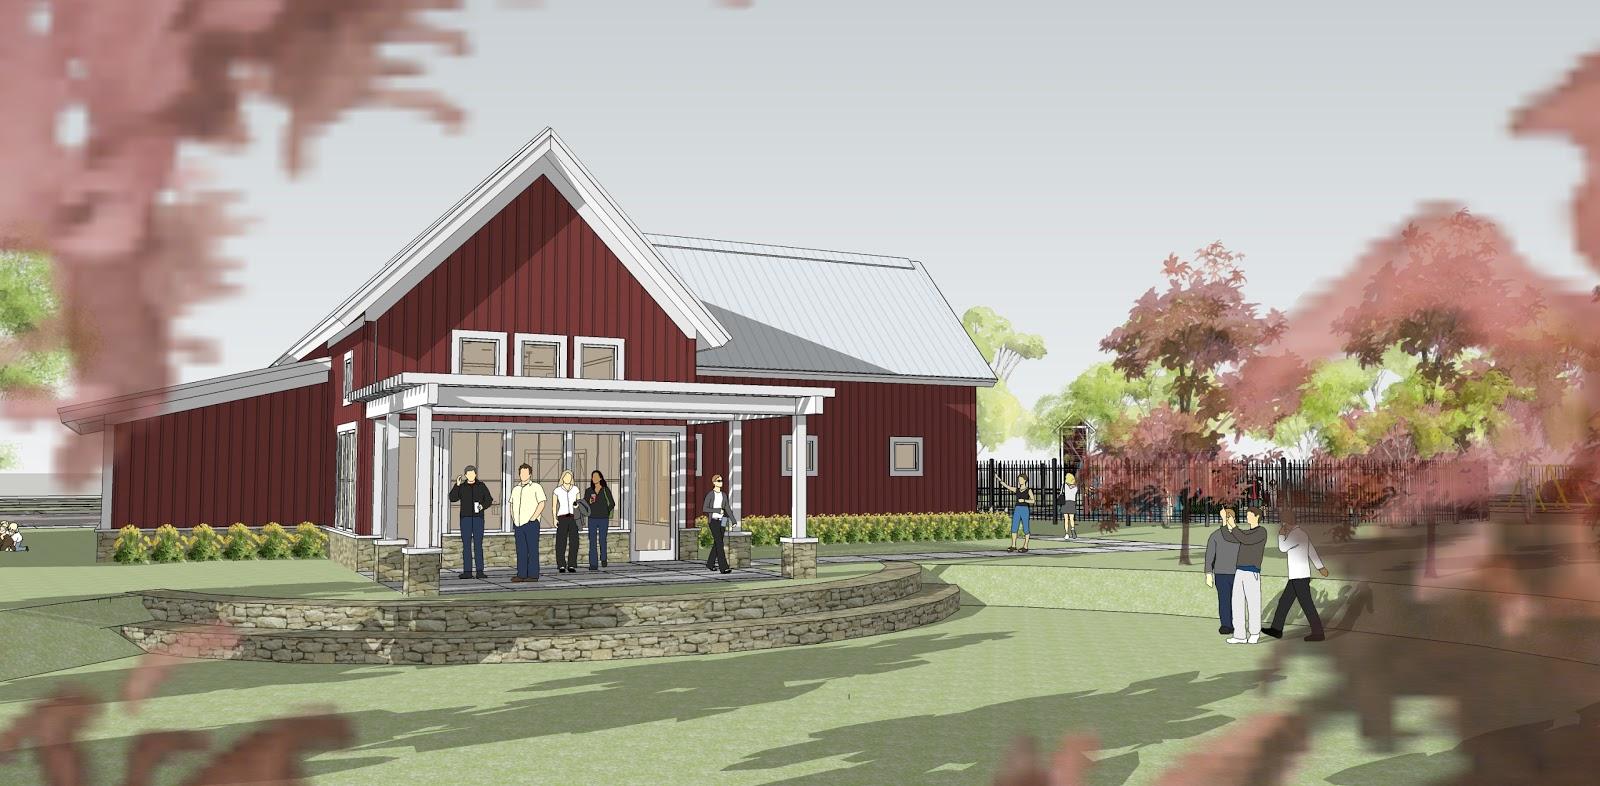 Simply elegant home designs blog new community building for Simply elegant house plans